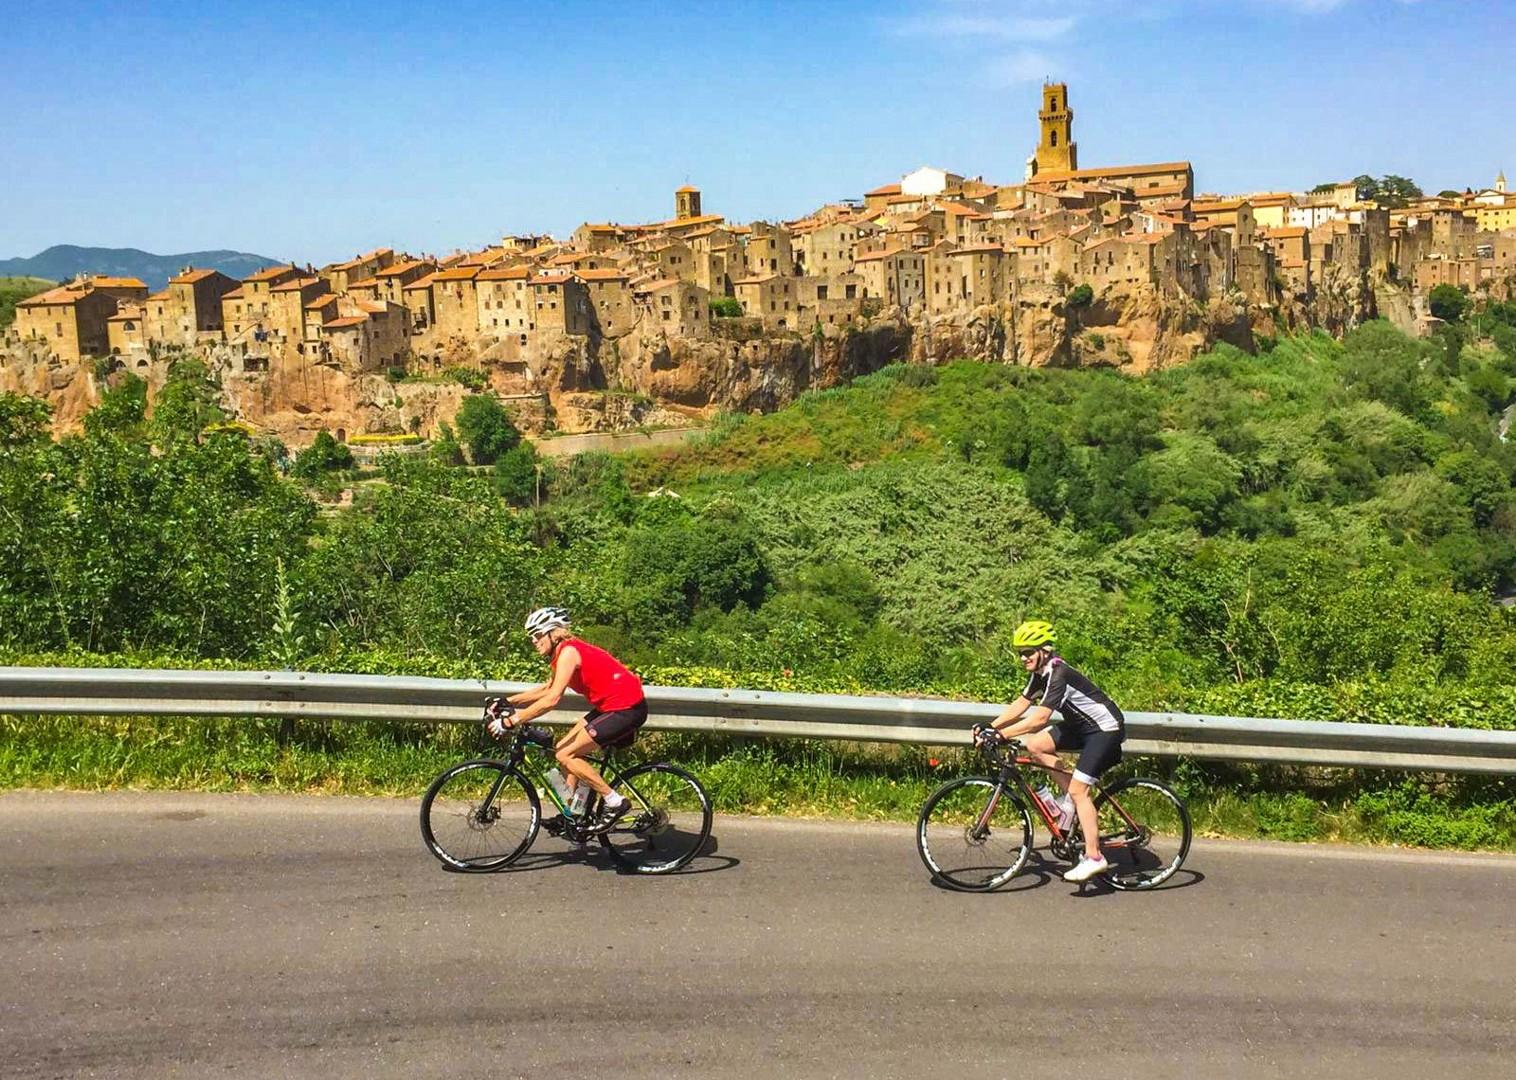 ladriatico-al-tirreno-bike-cycling-guided-road-with-saddle-skedaddle-tour.jpg - NEW! Italy - Coast to Coast - L'Adriatico al Tirreno - Road Cycling